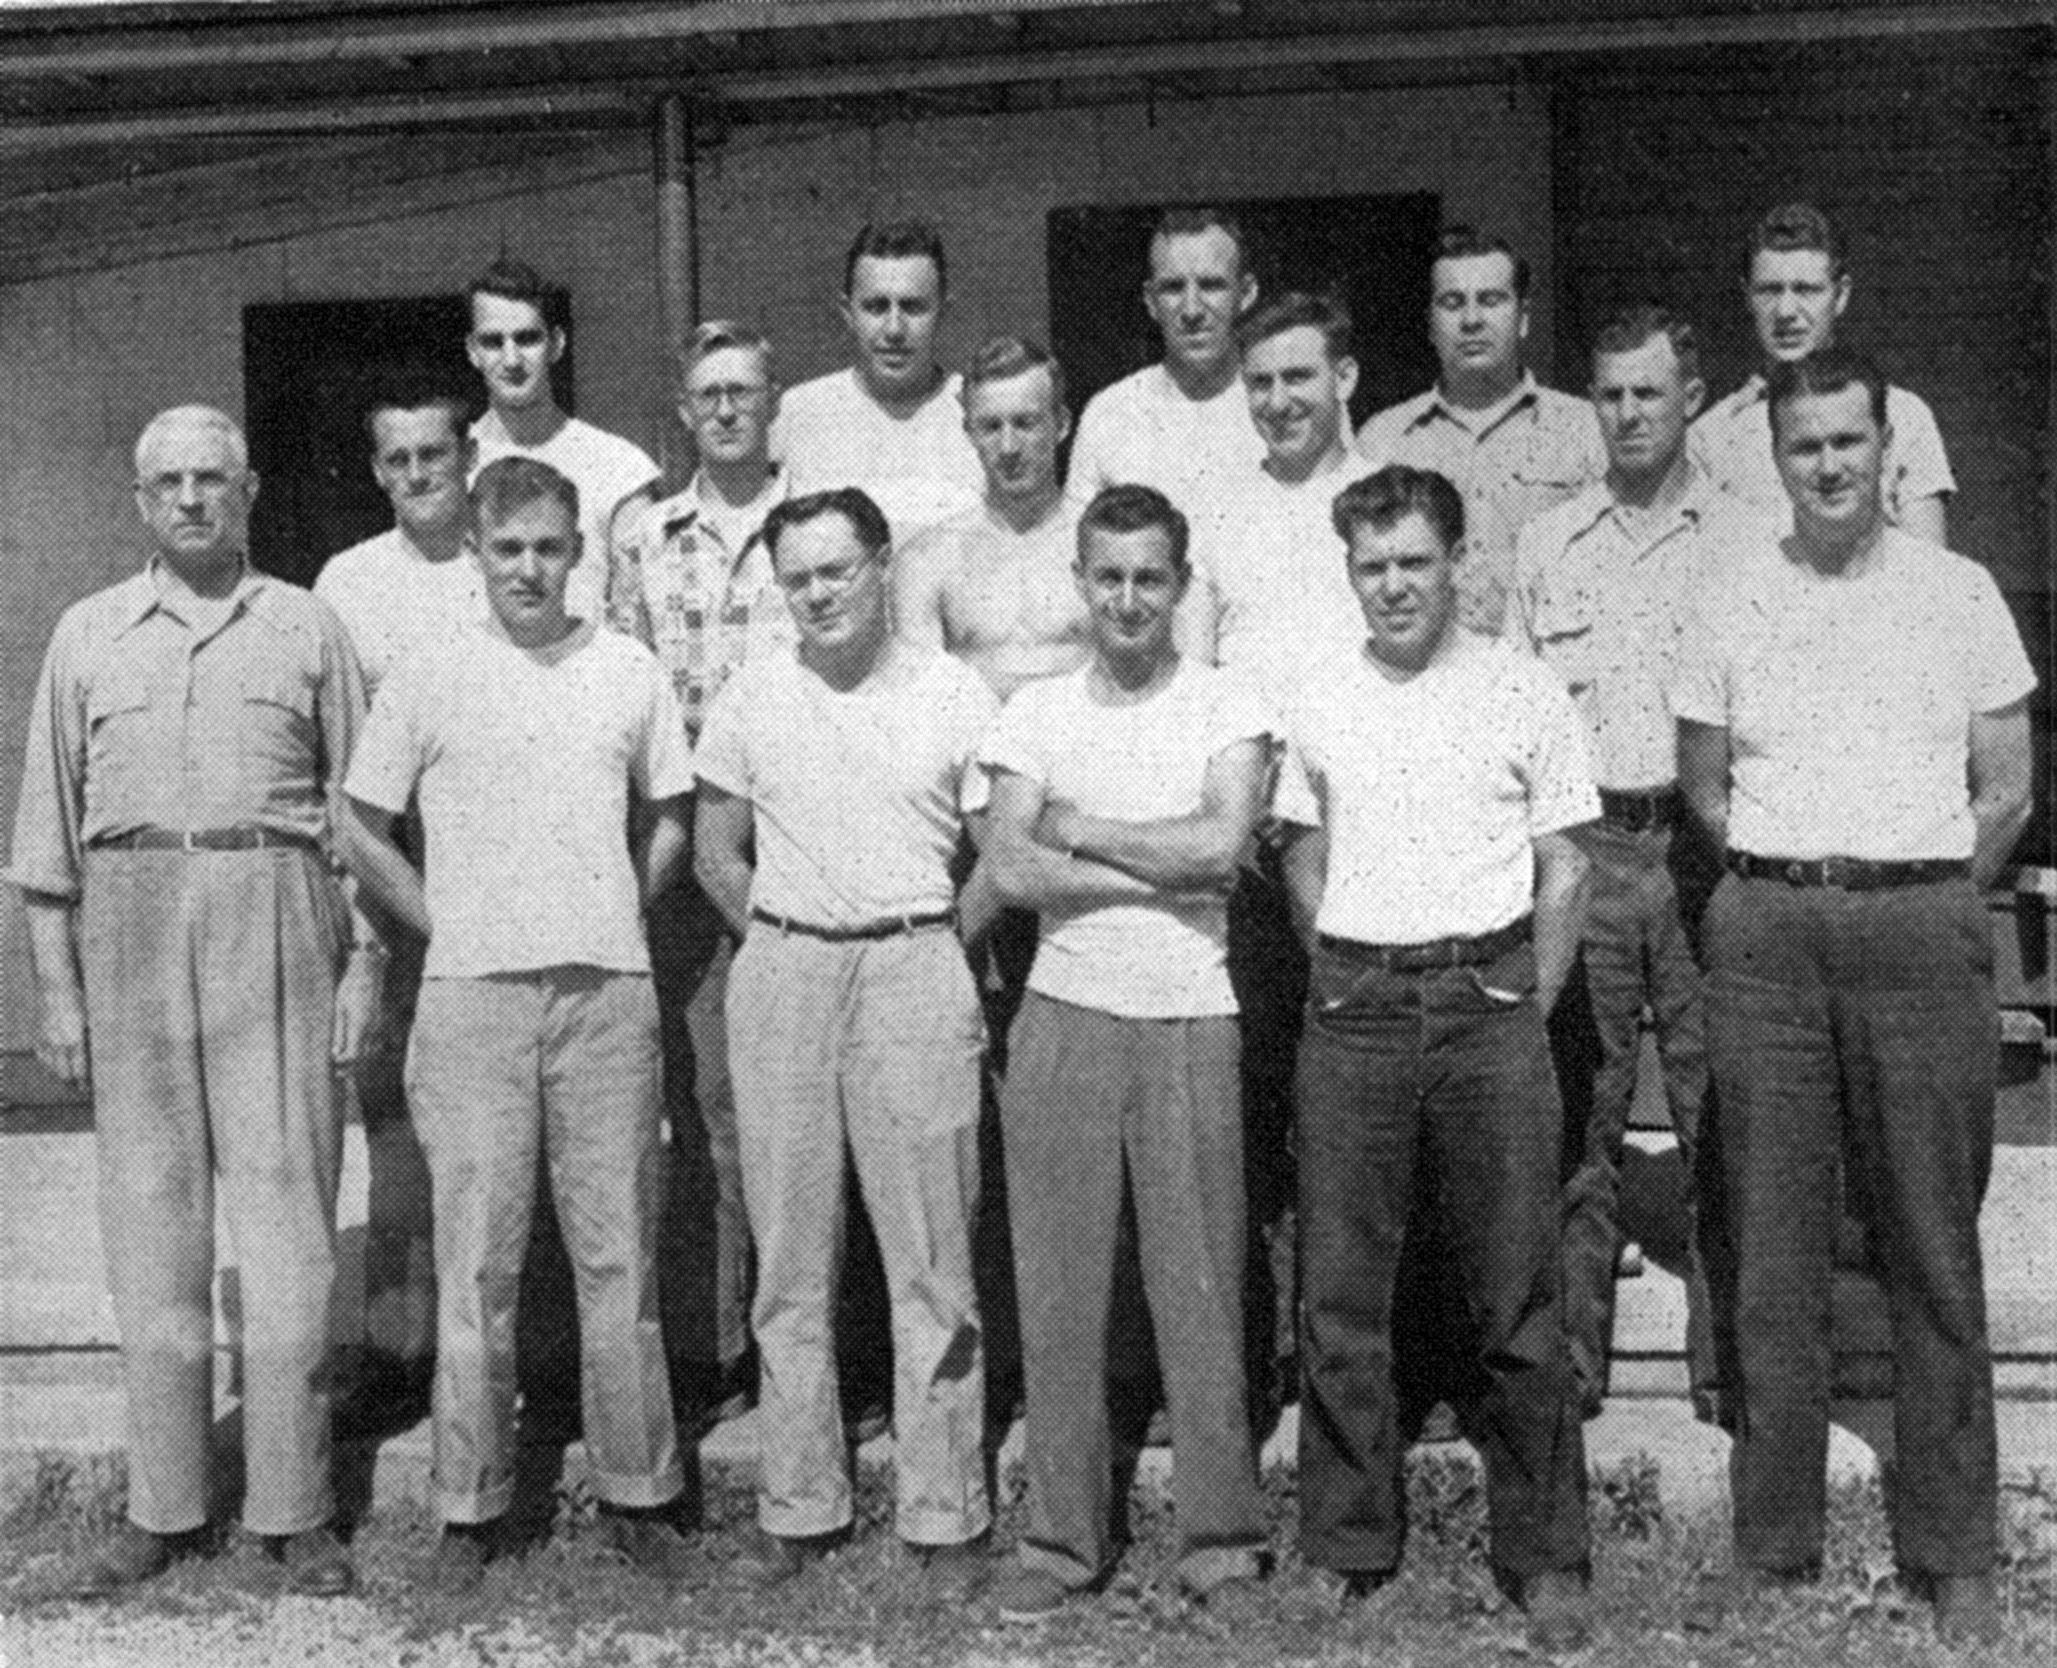 1952 Cadet School Magee